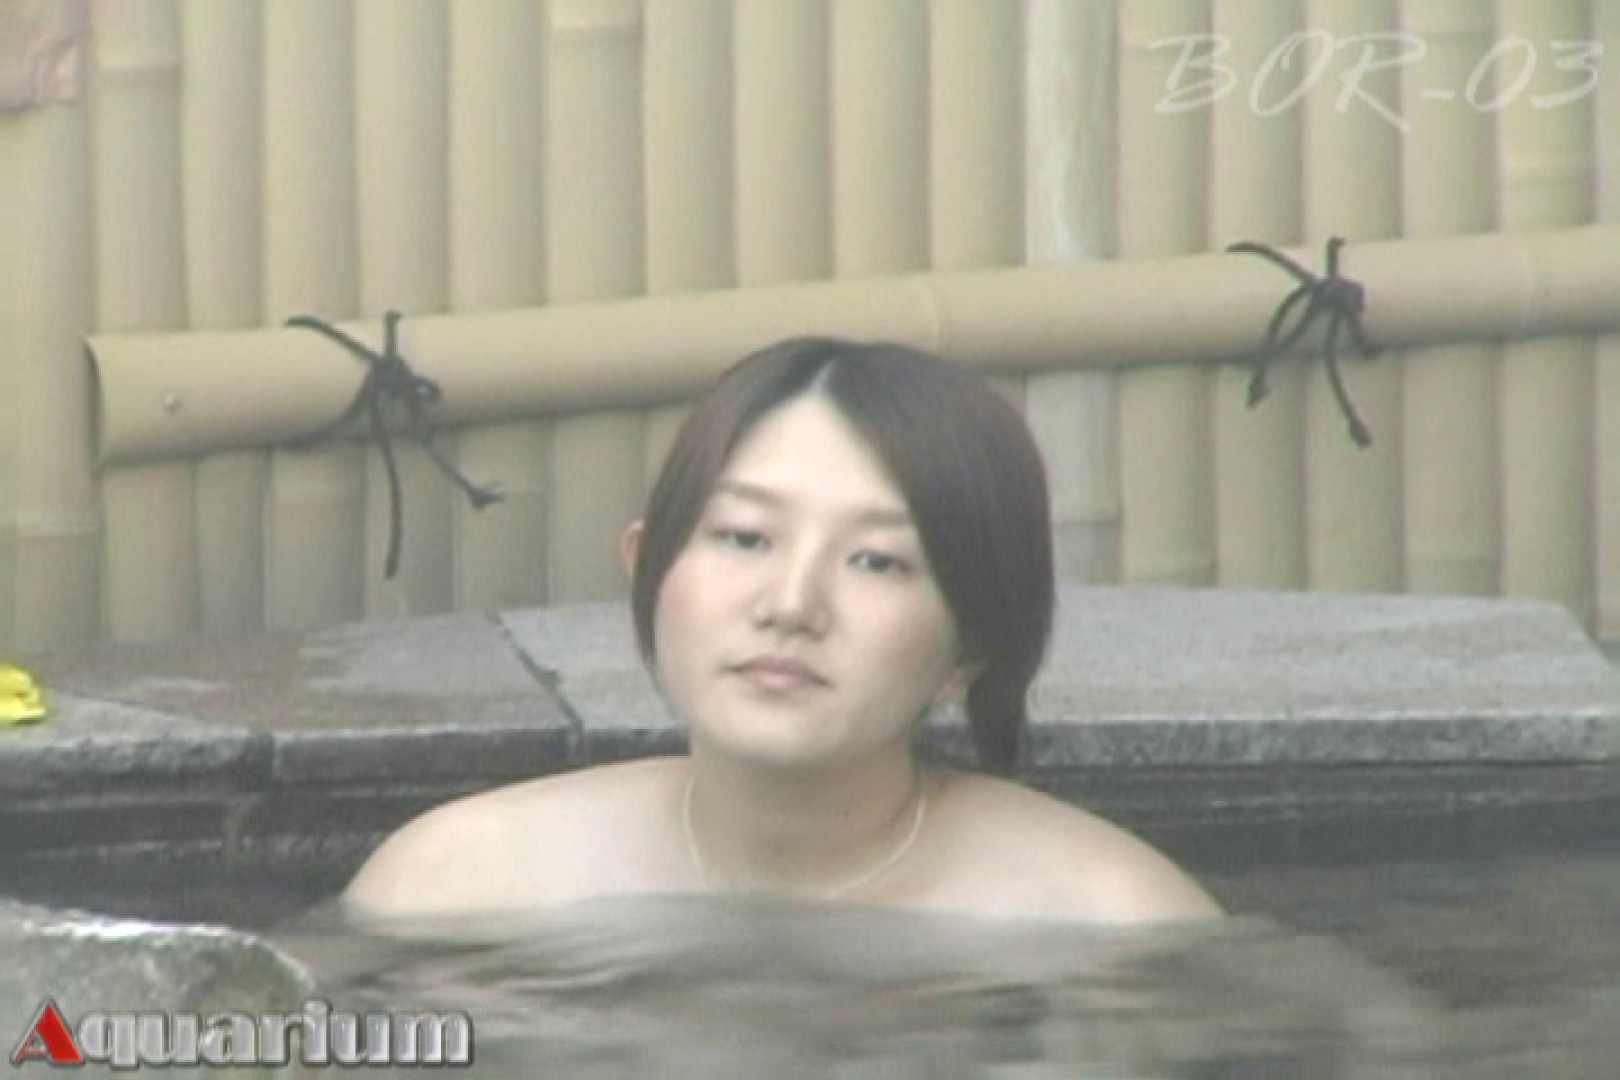 Aquaな露天風呂Vol.487 OLエロ画像 盗撮セックス無修正動画無料 42PICs 11